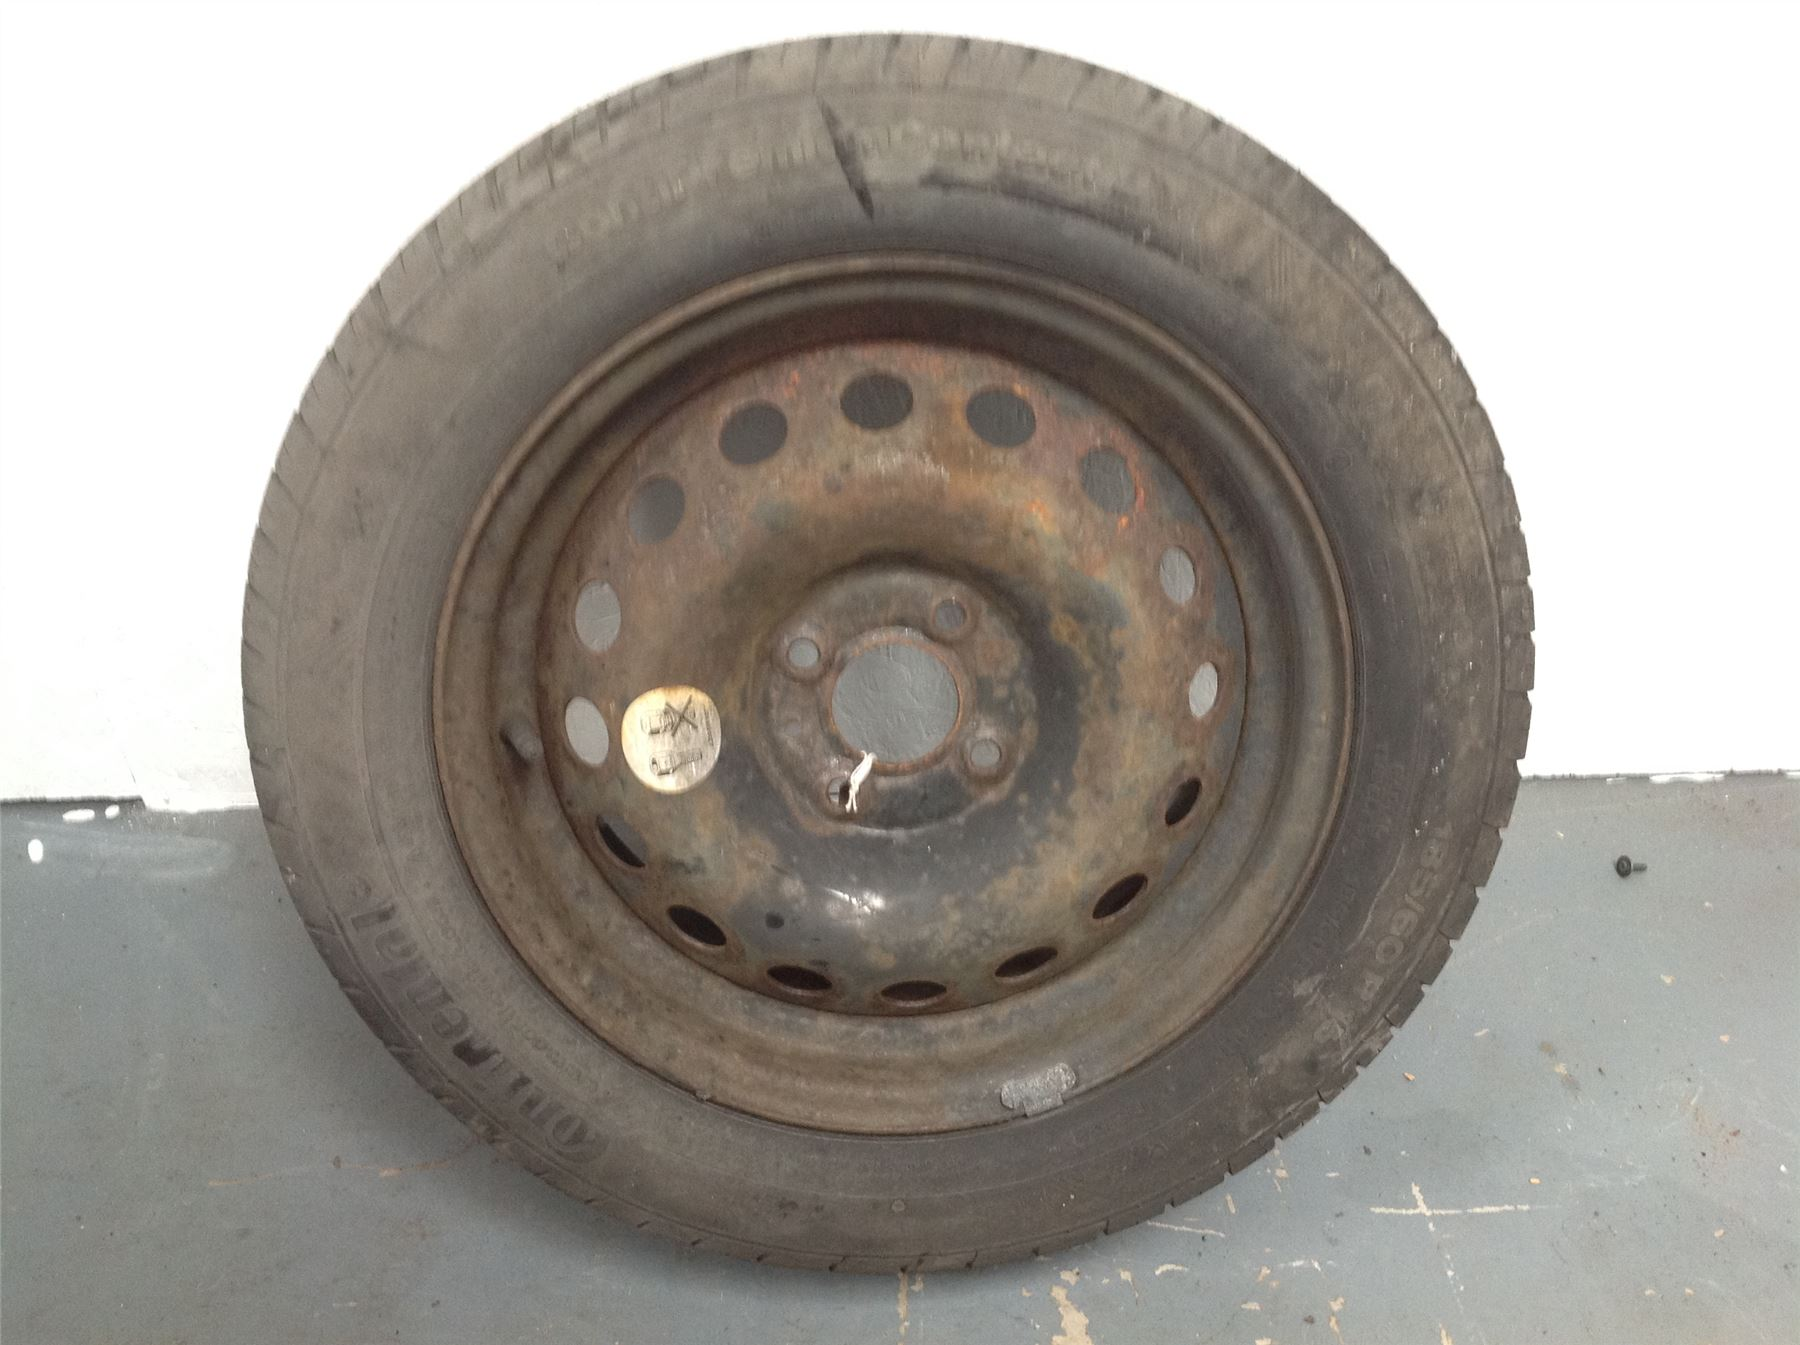 renault clio mk3 2005 2009 steel spare wheel 185 60 r15 ebay. Black Bedroom Furniture Sets. Home Design Ideas